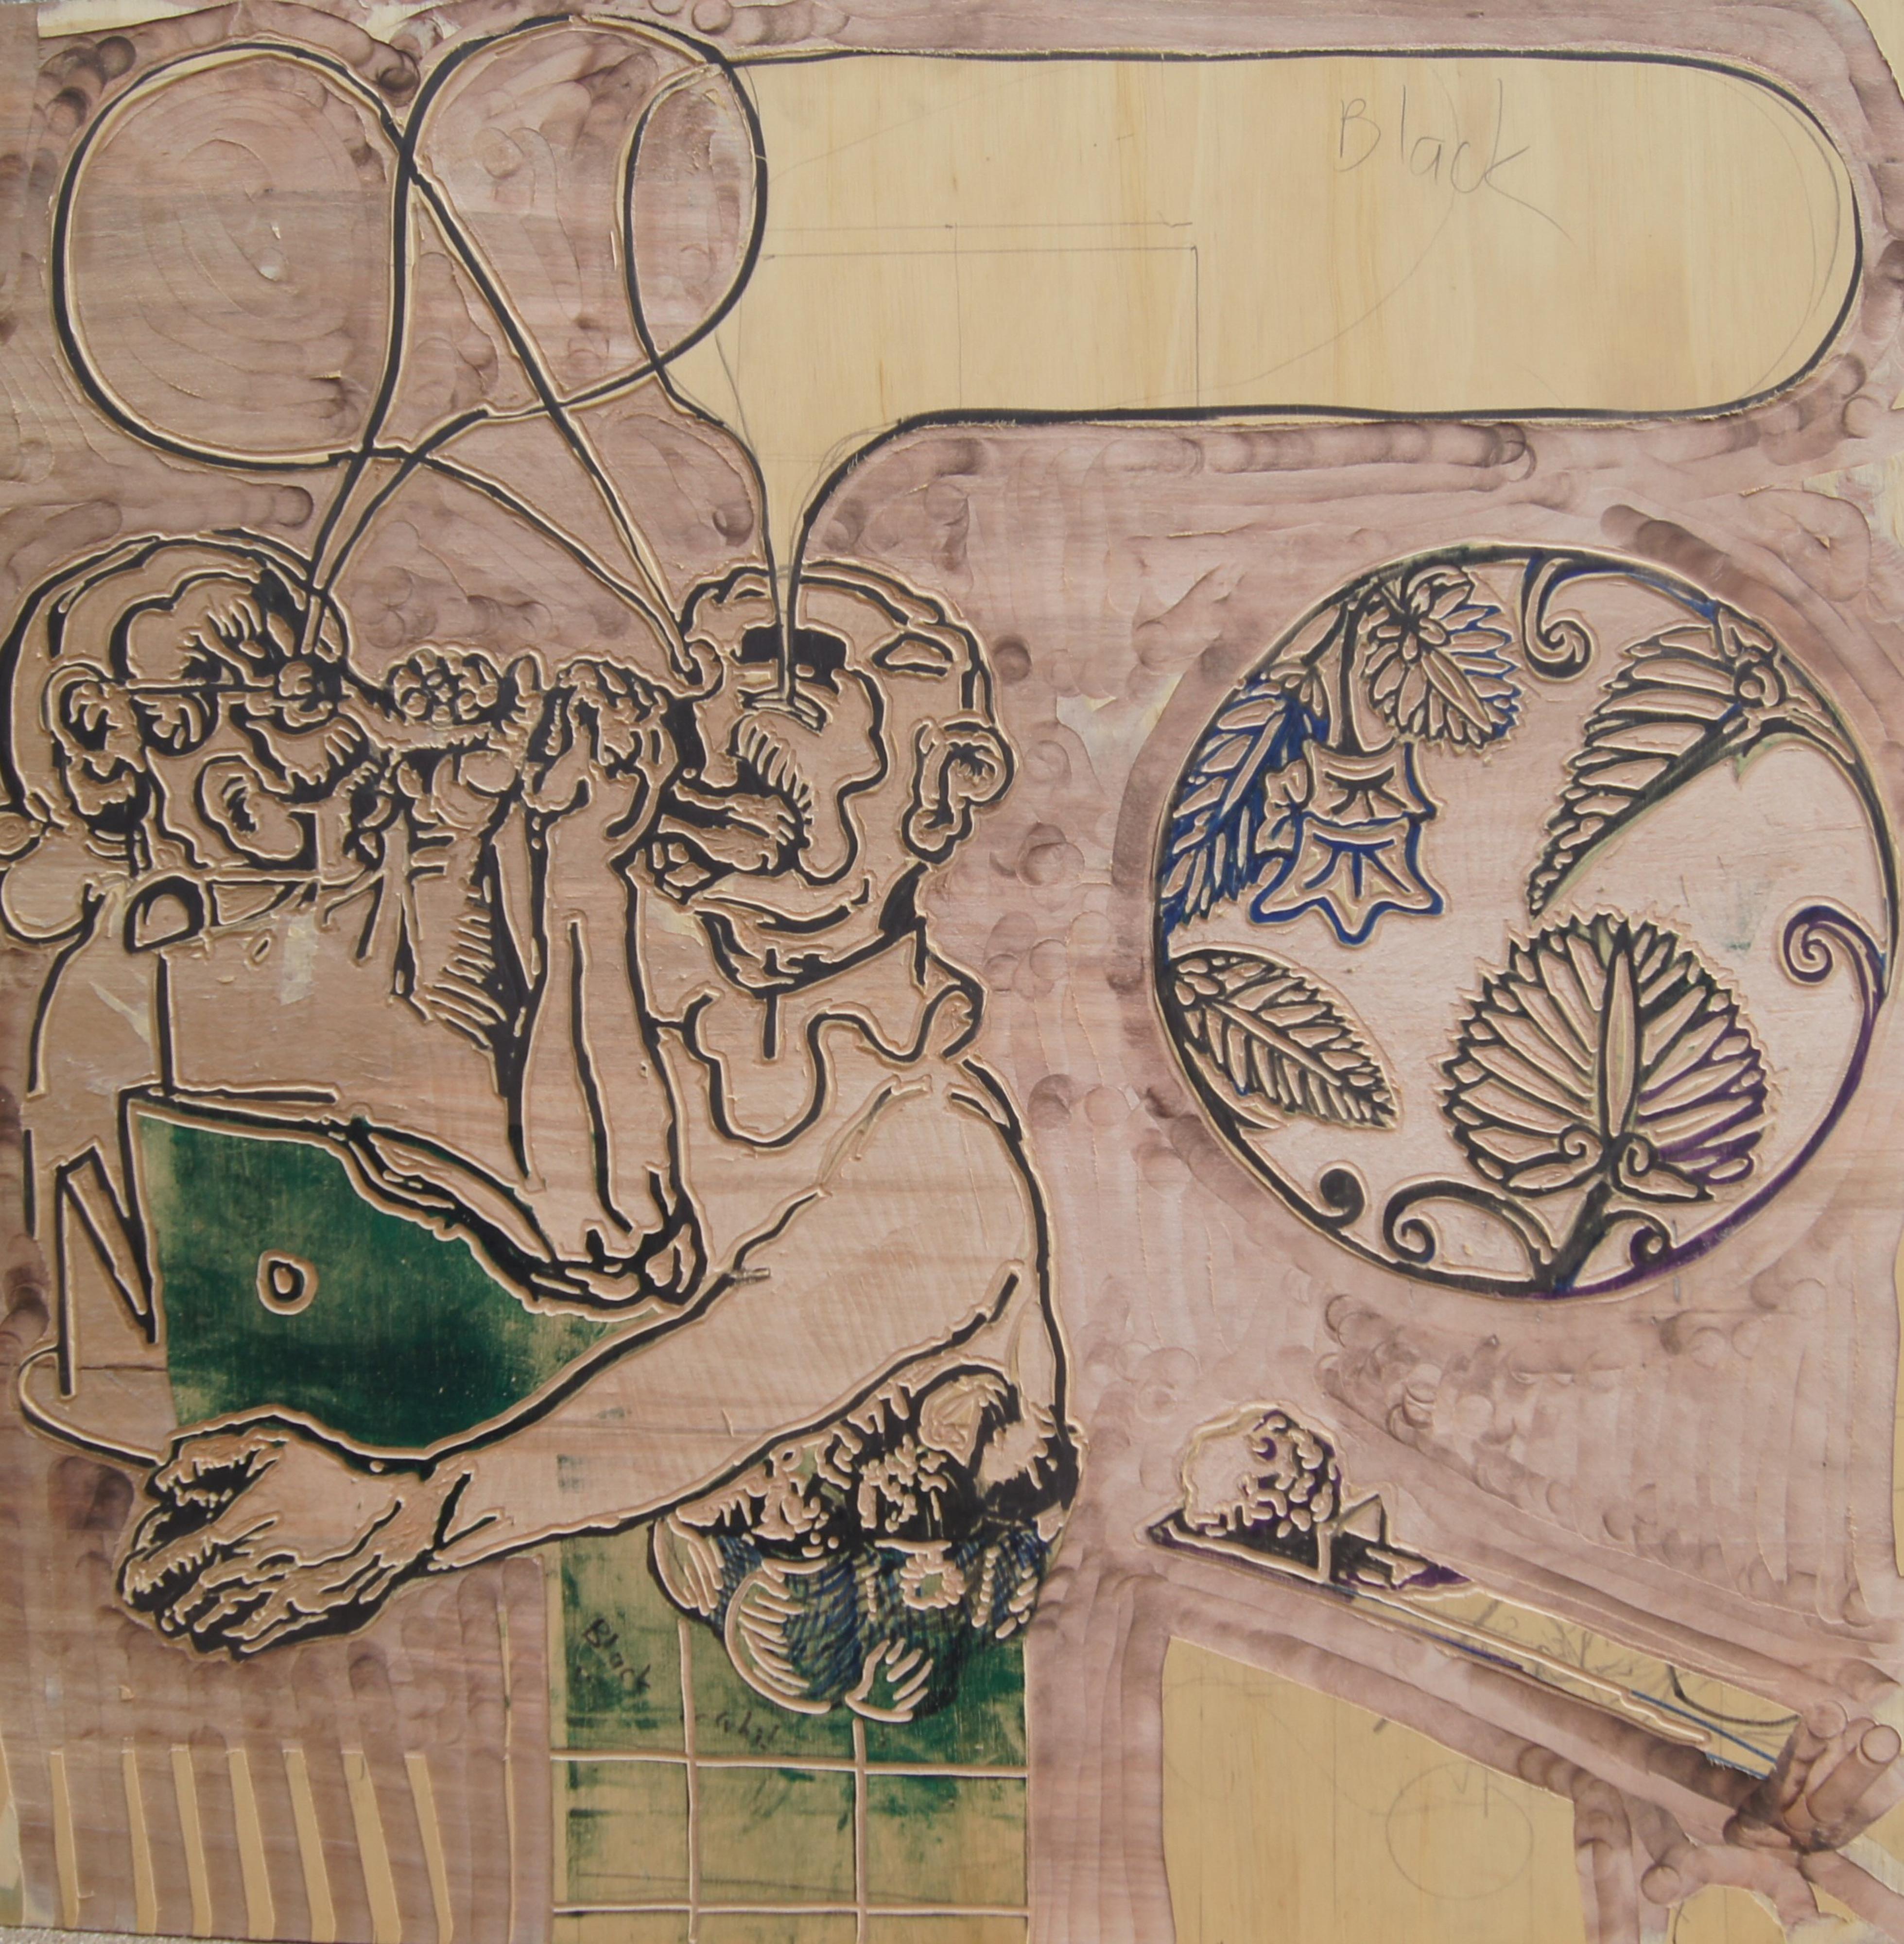 Galerie Barbara Thumm \ New Viewings #22 \ Johnny Miller